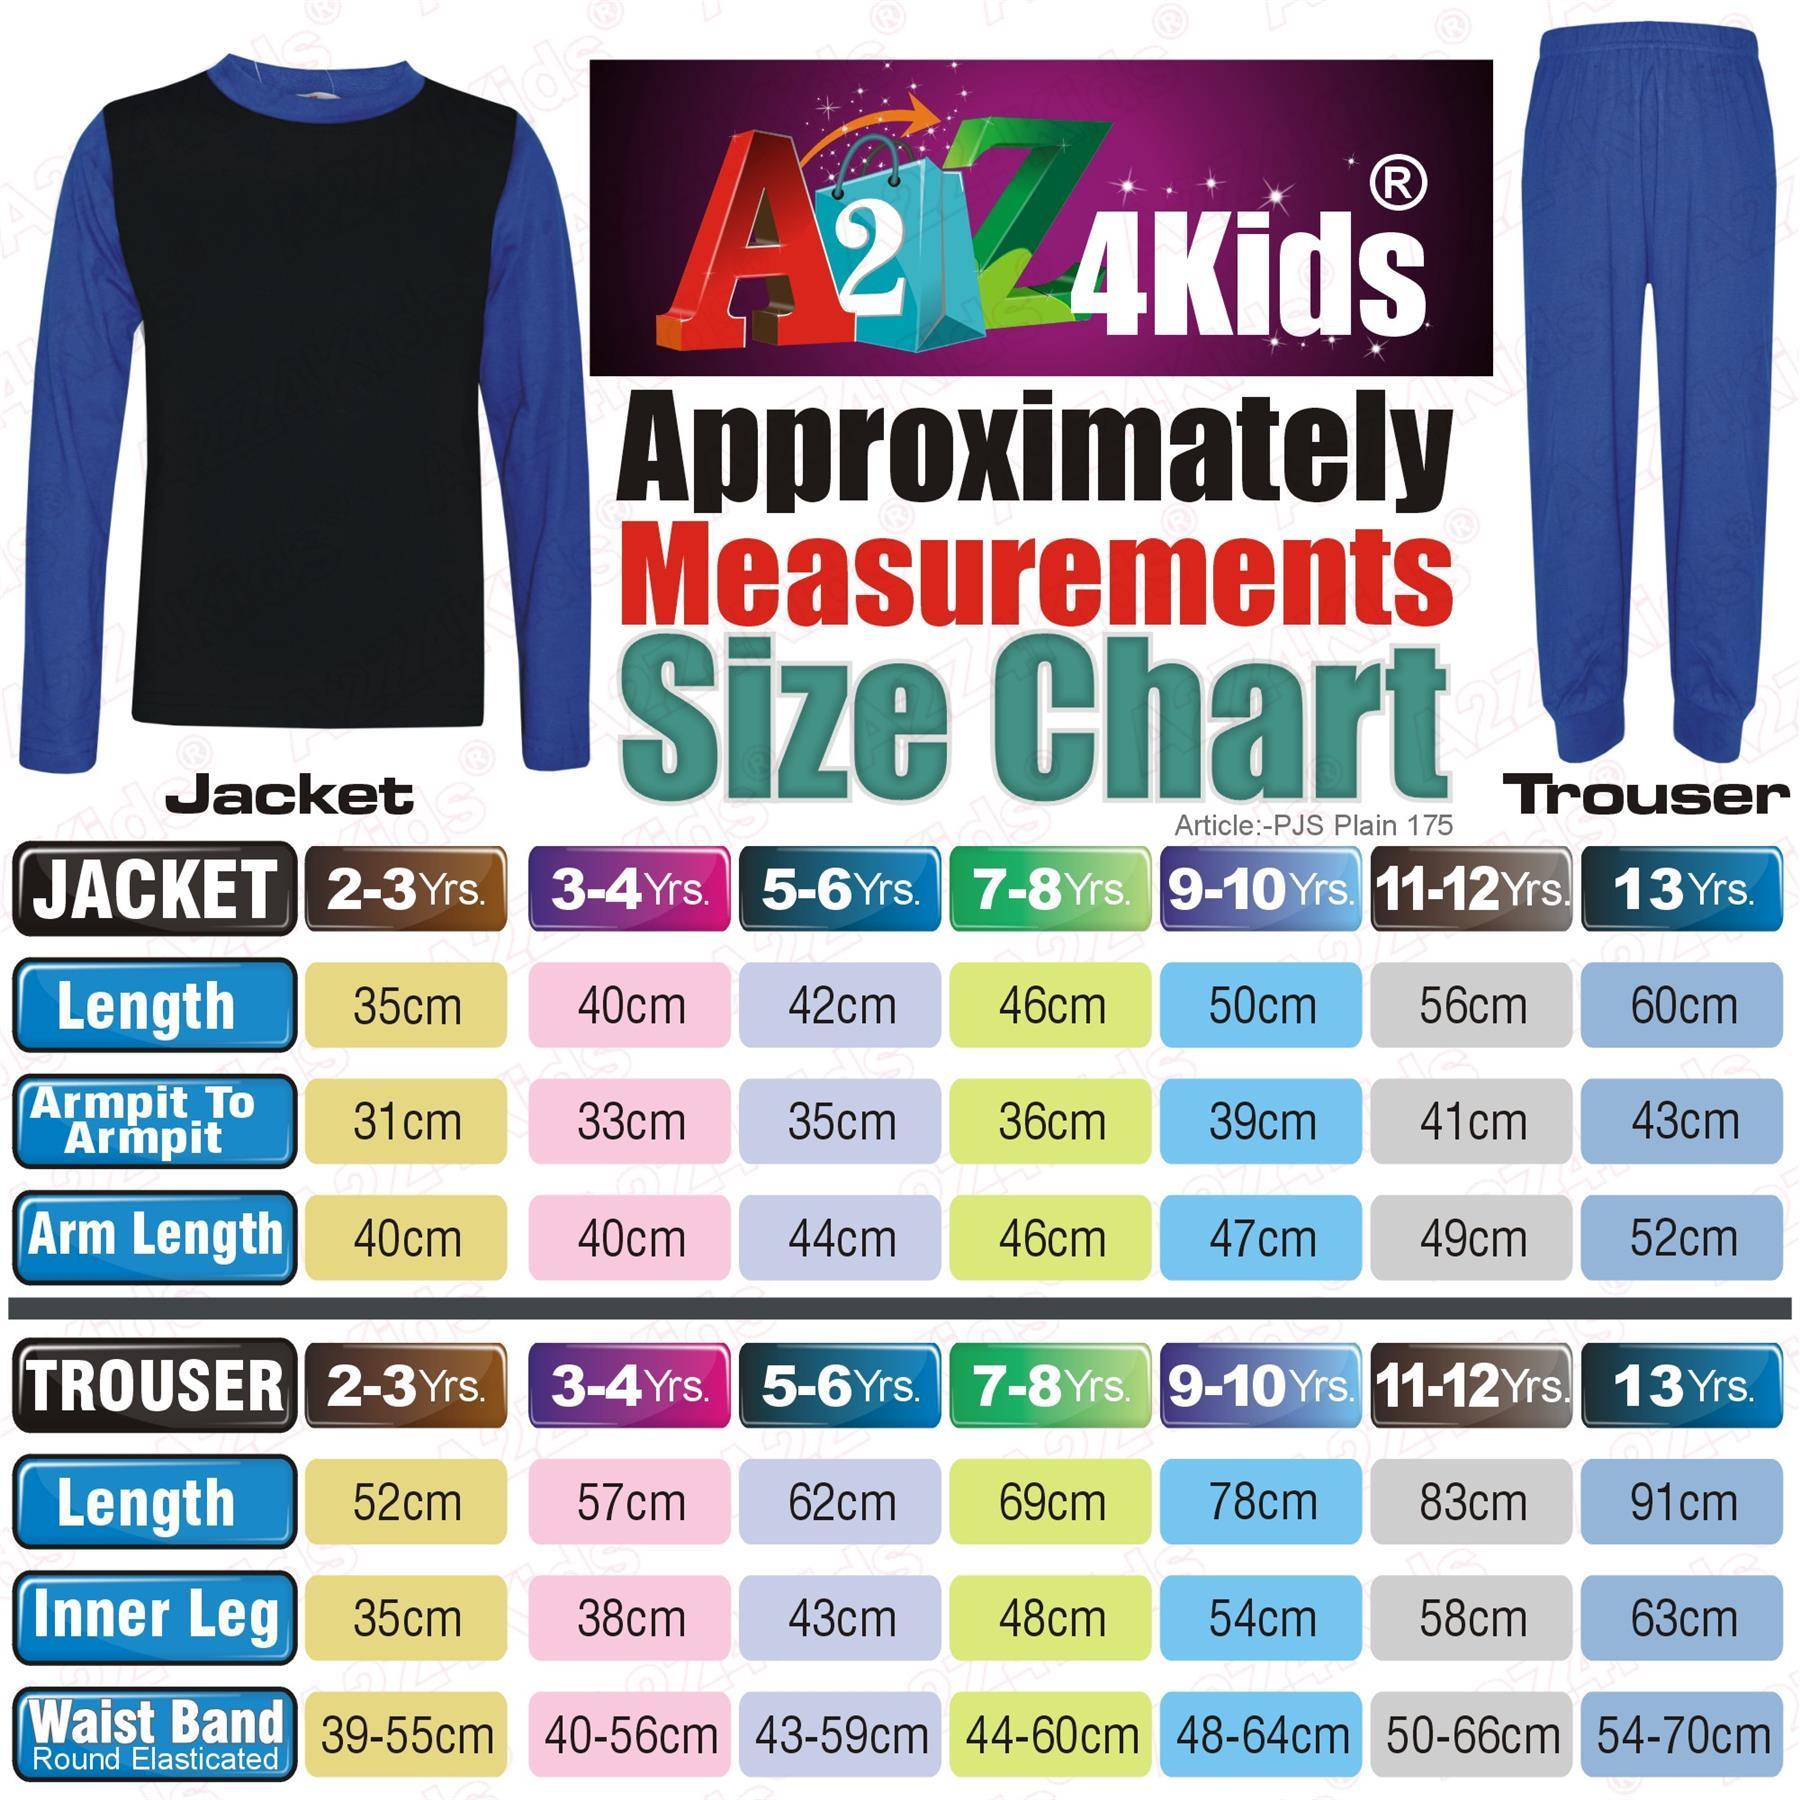 Kids Girls Boys Pjs Contrast Royal Blue Color Plain Stylish Pyjamas Set 2-13 Yr